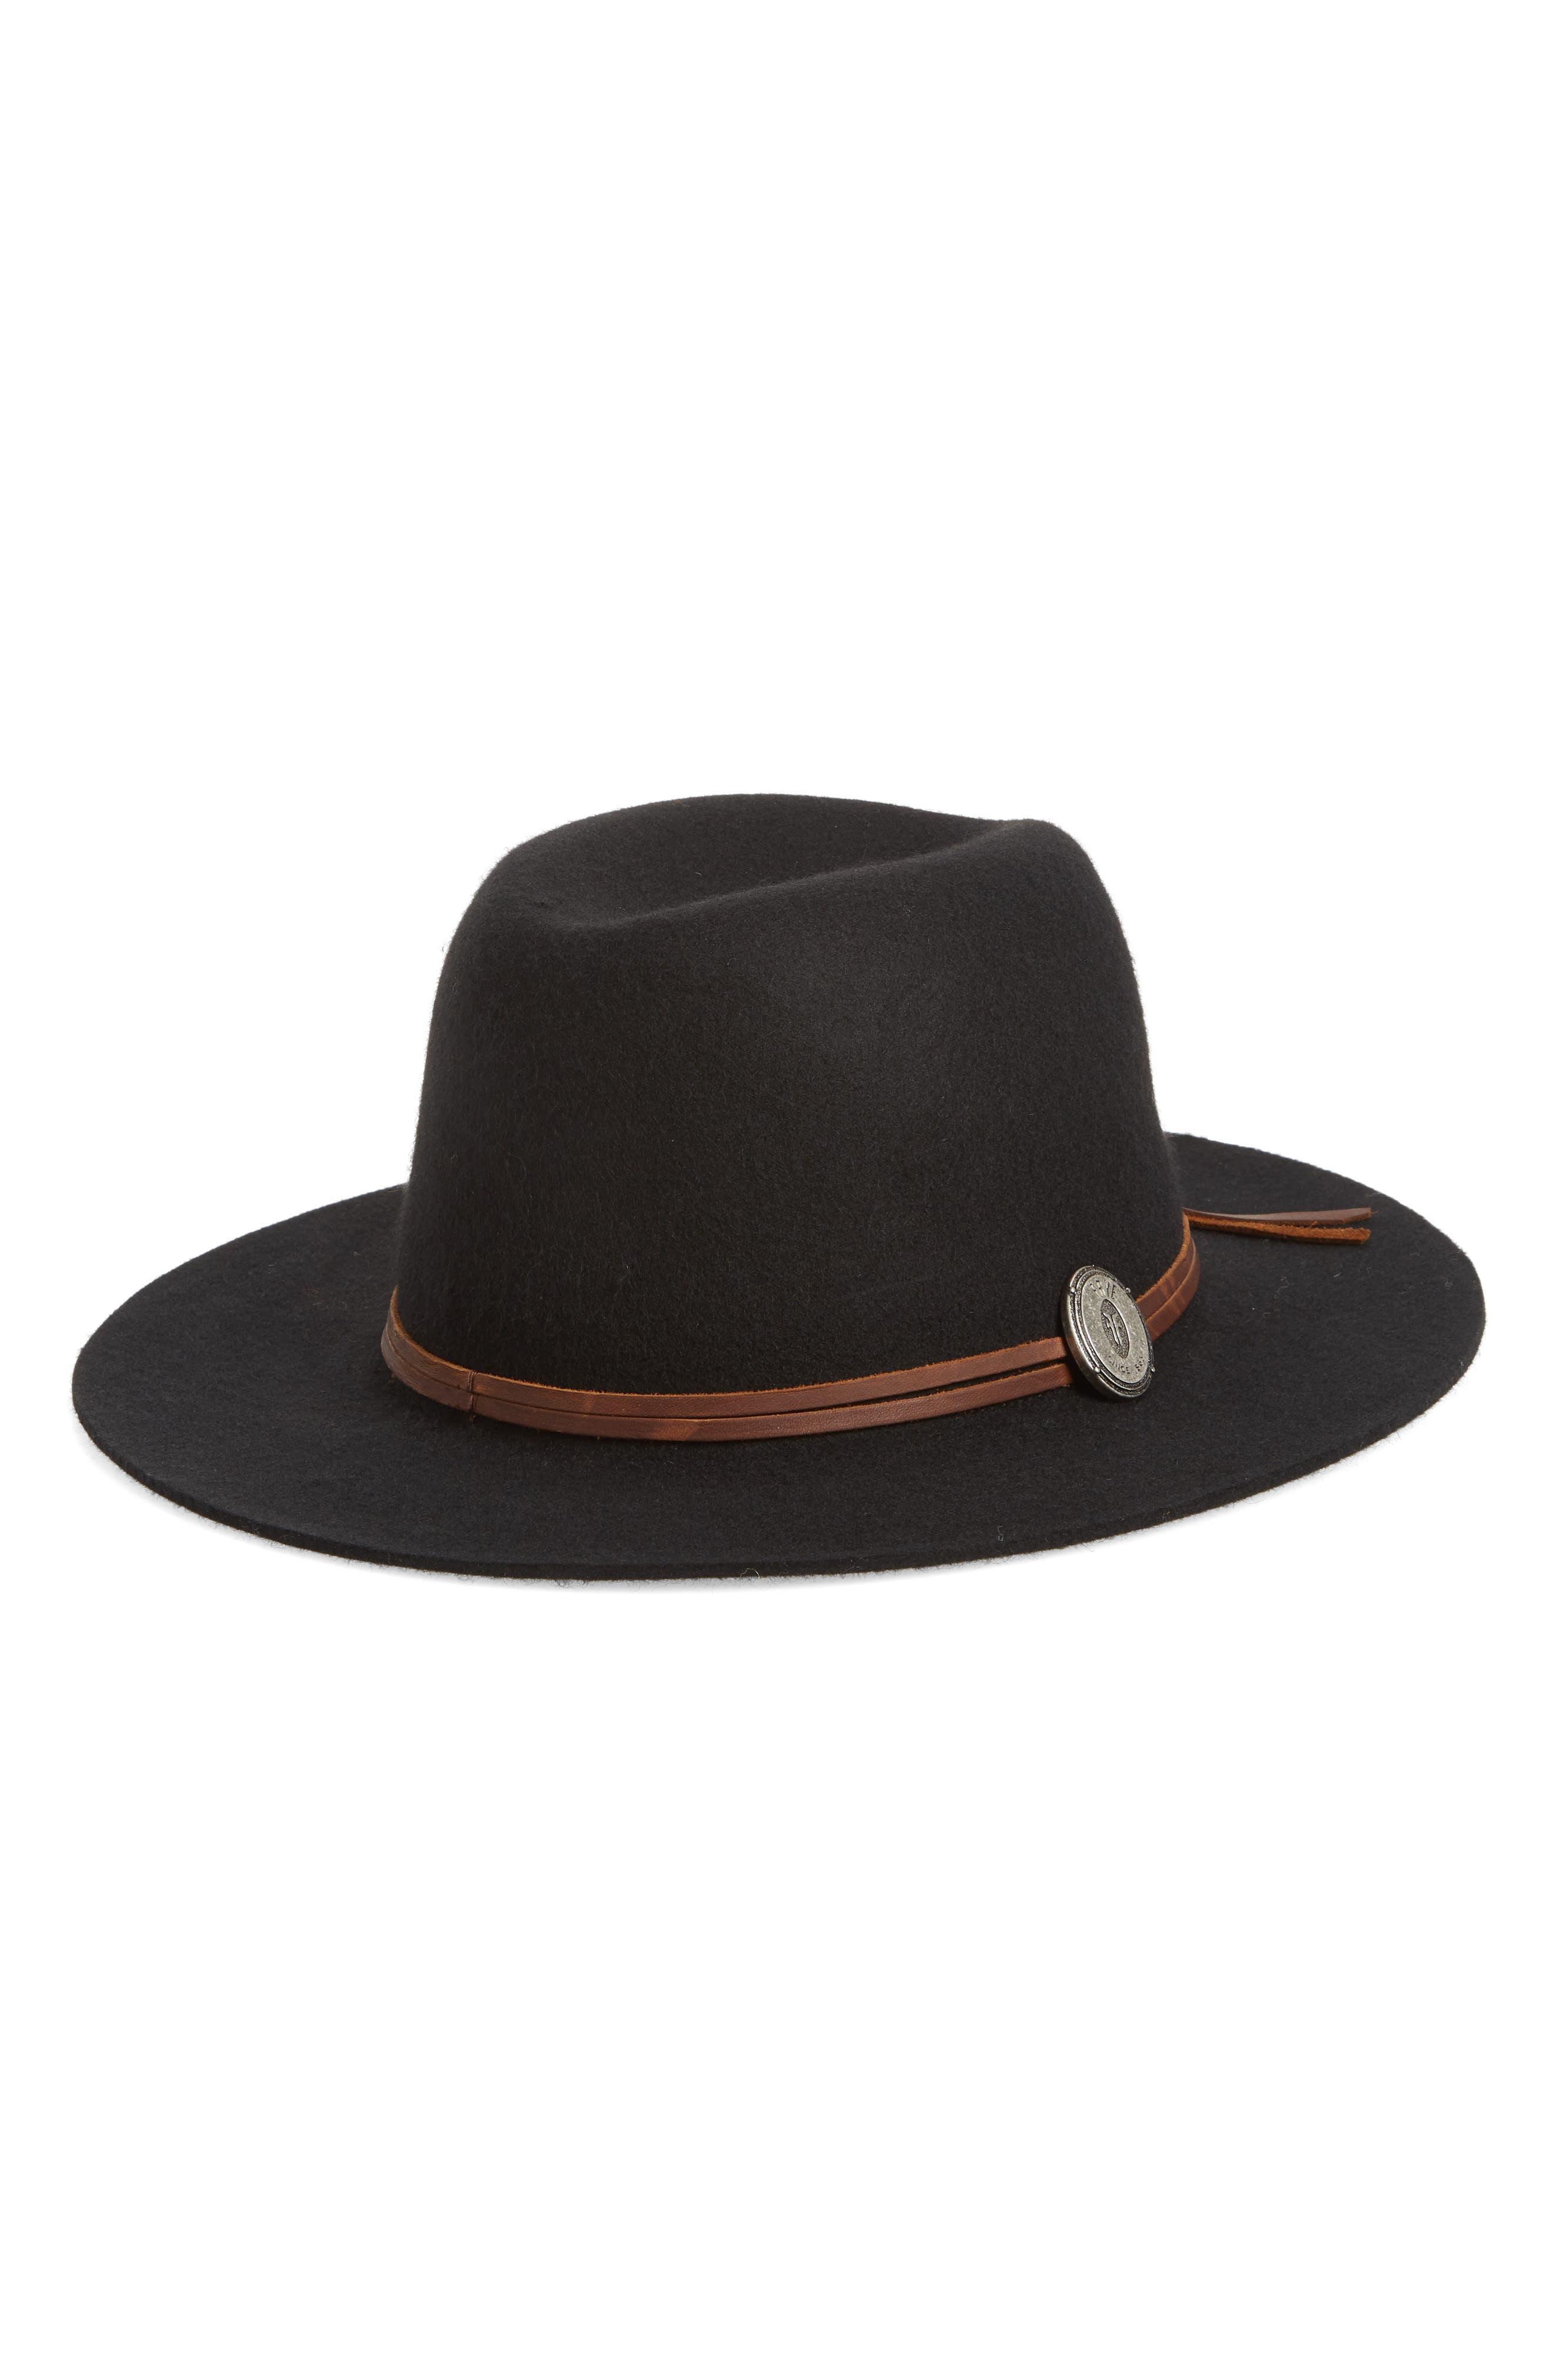 Cadet Dented Crown Wool Felt Hat,                             Main thumbnail 1, color,                             BLACK